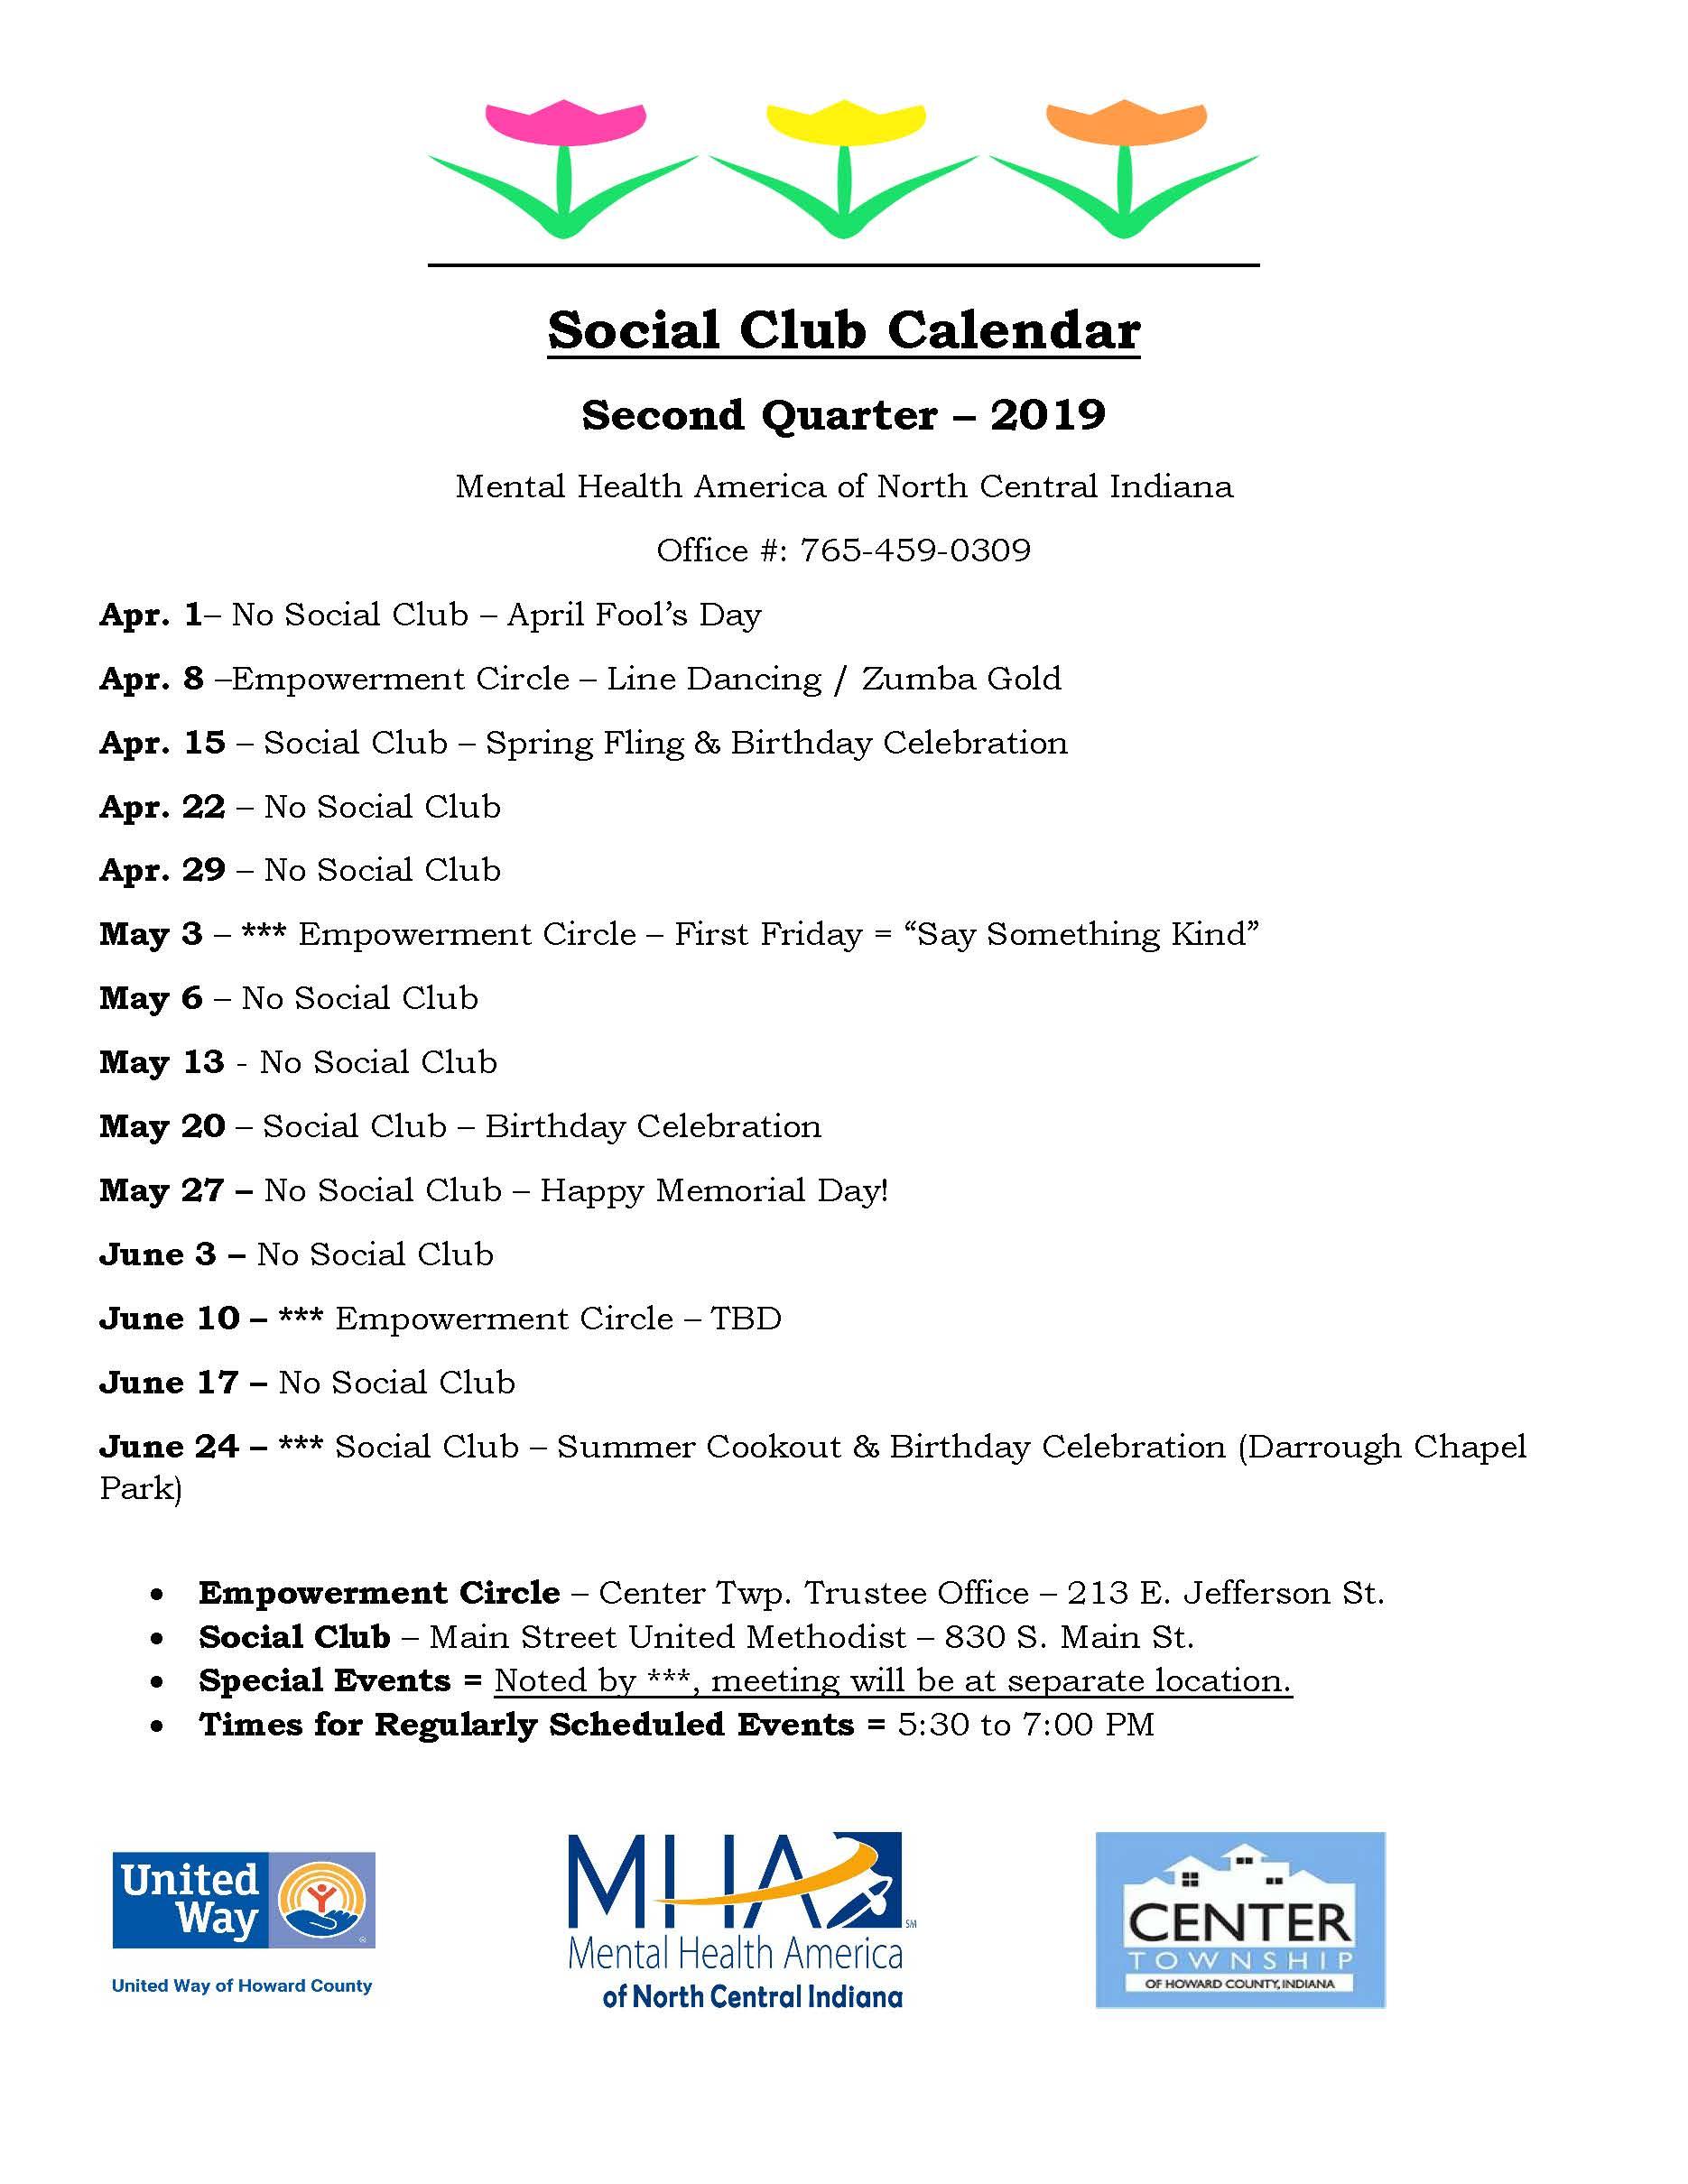 Social Club / Empowerment Circle - 2nd Qtr Calendar 2019